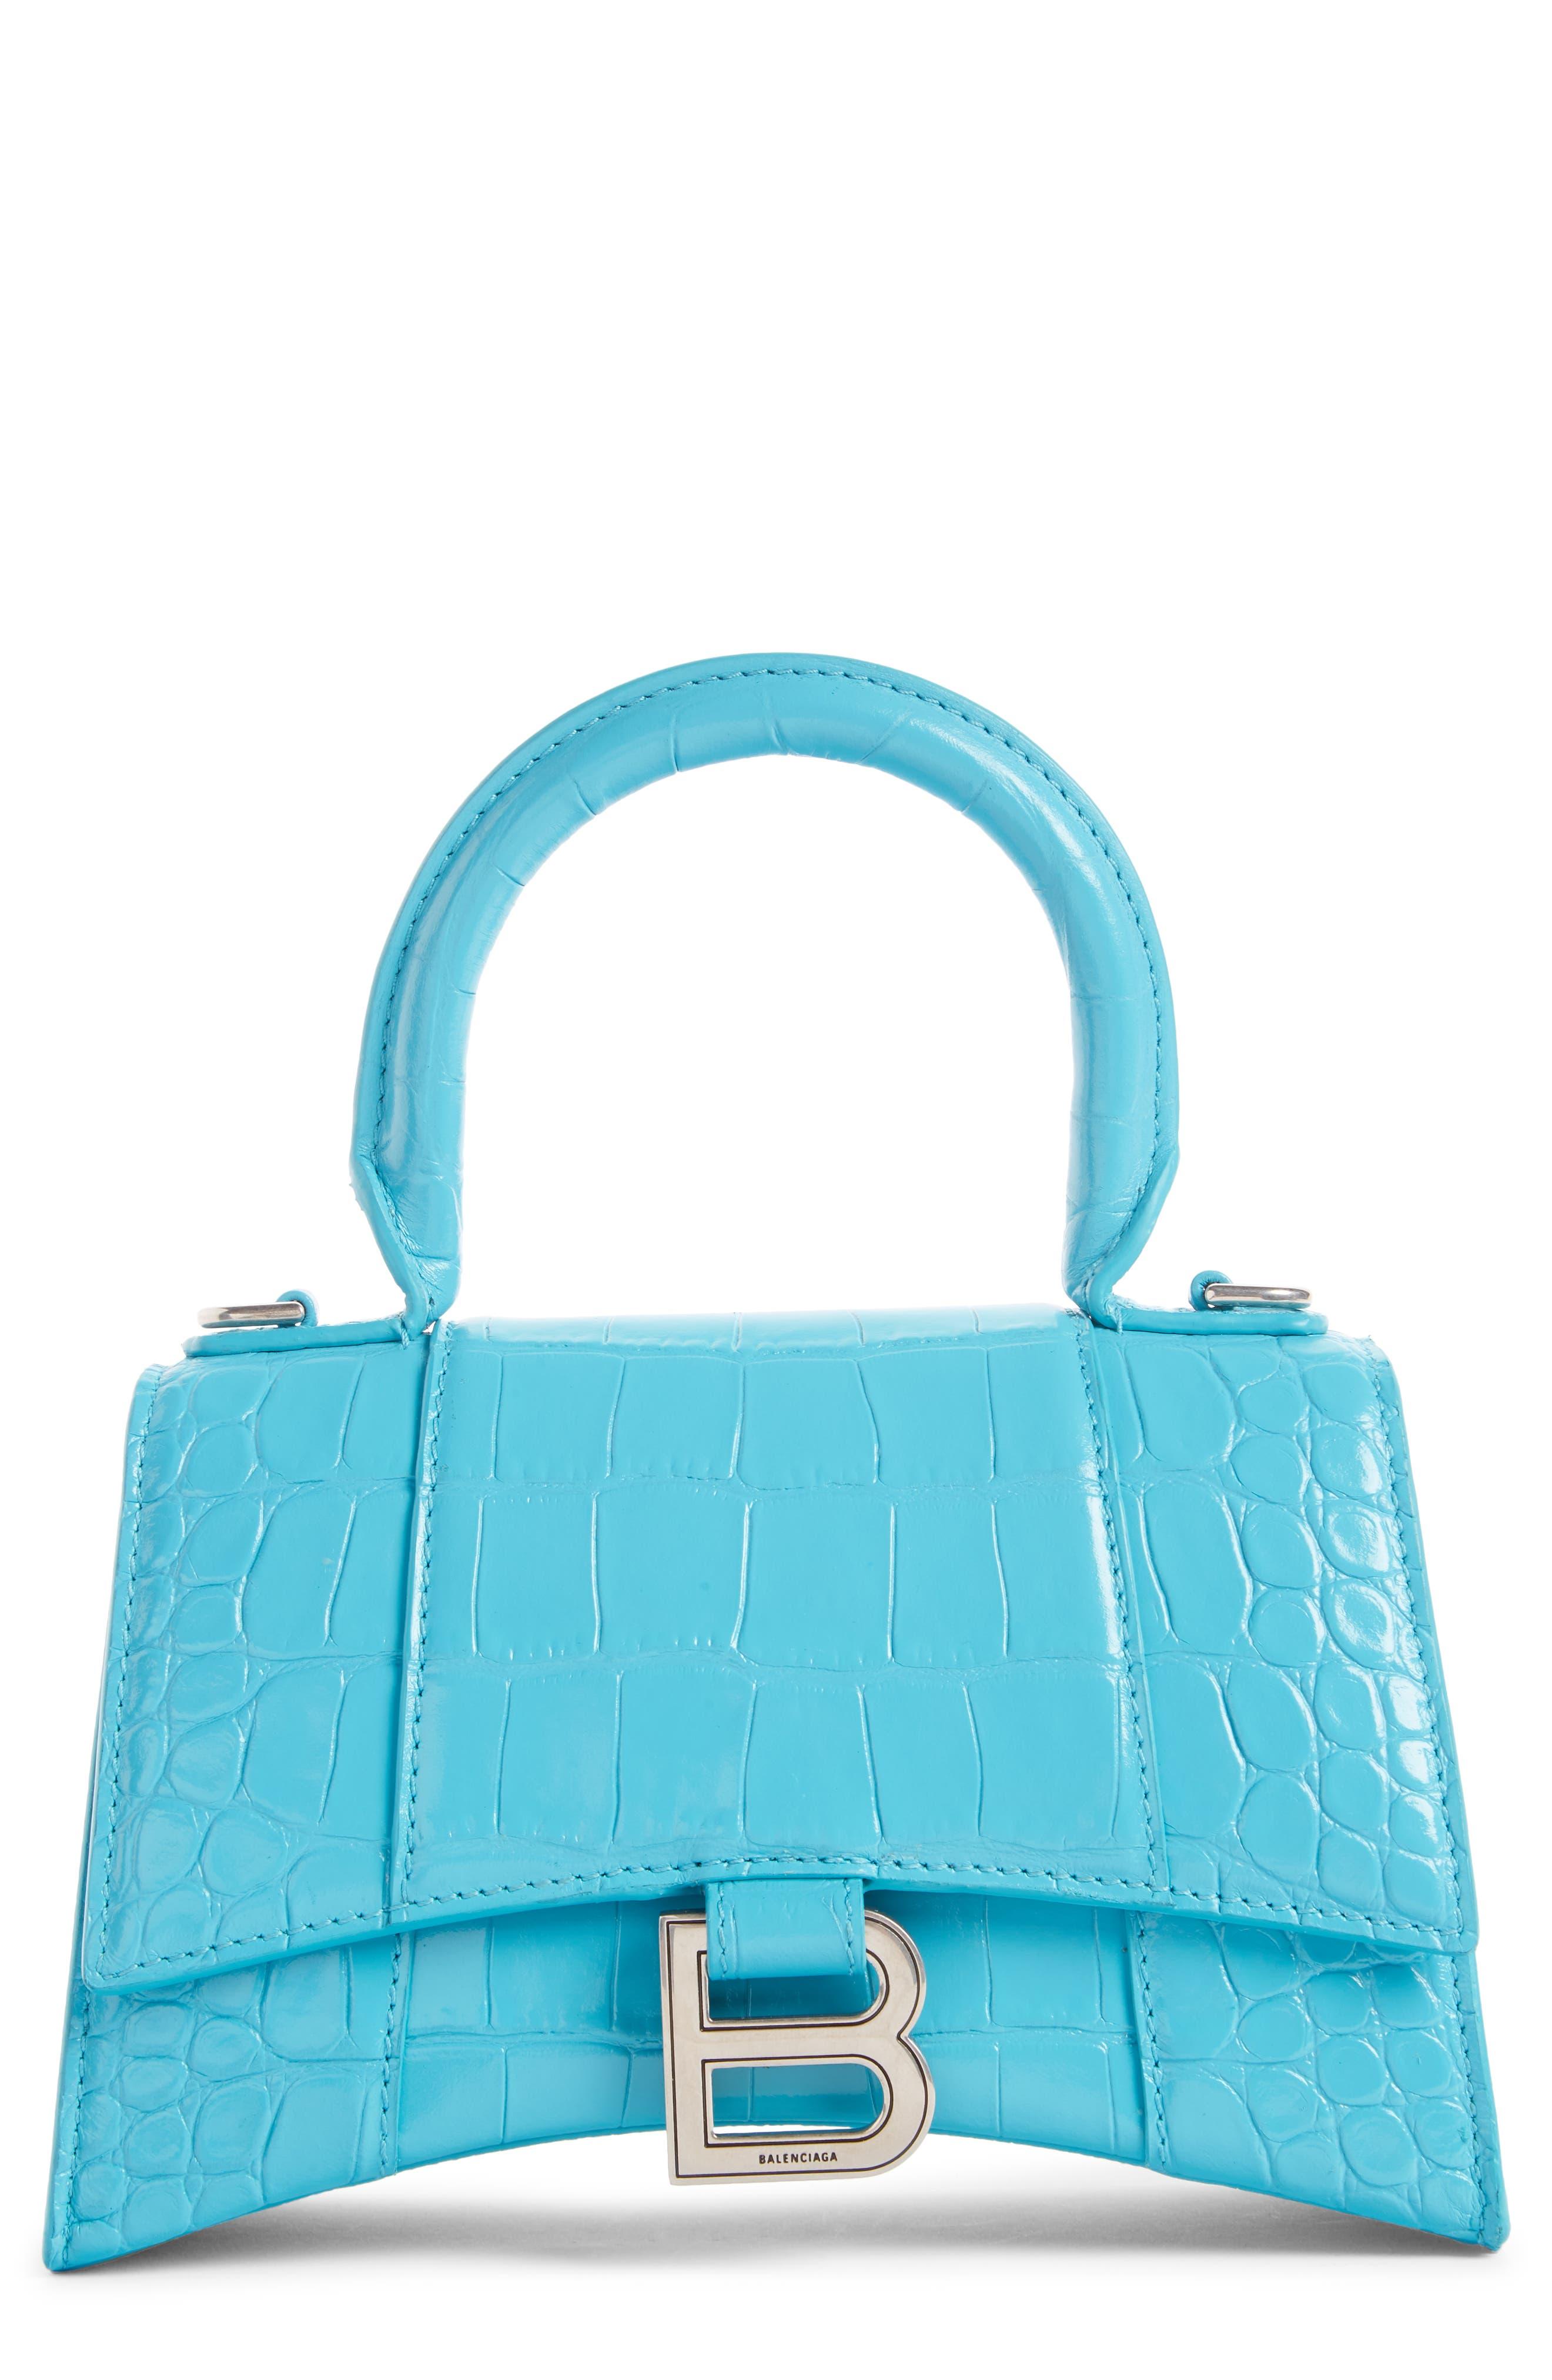 Balenciaga Handbags, Purses \u0026 Wallets